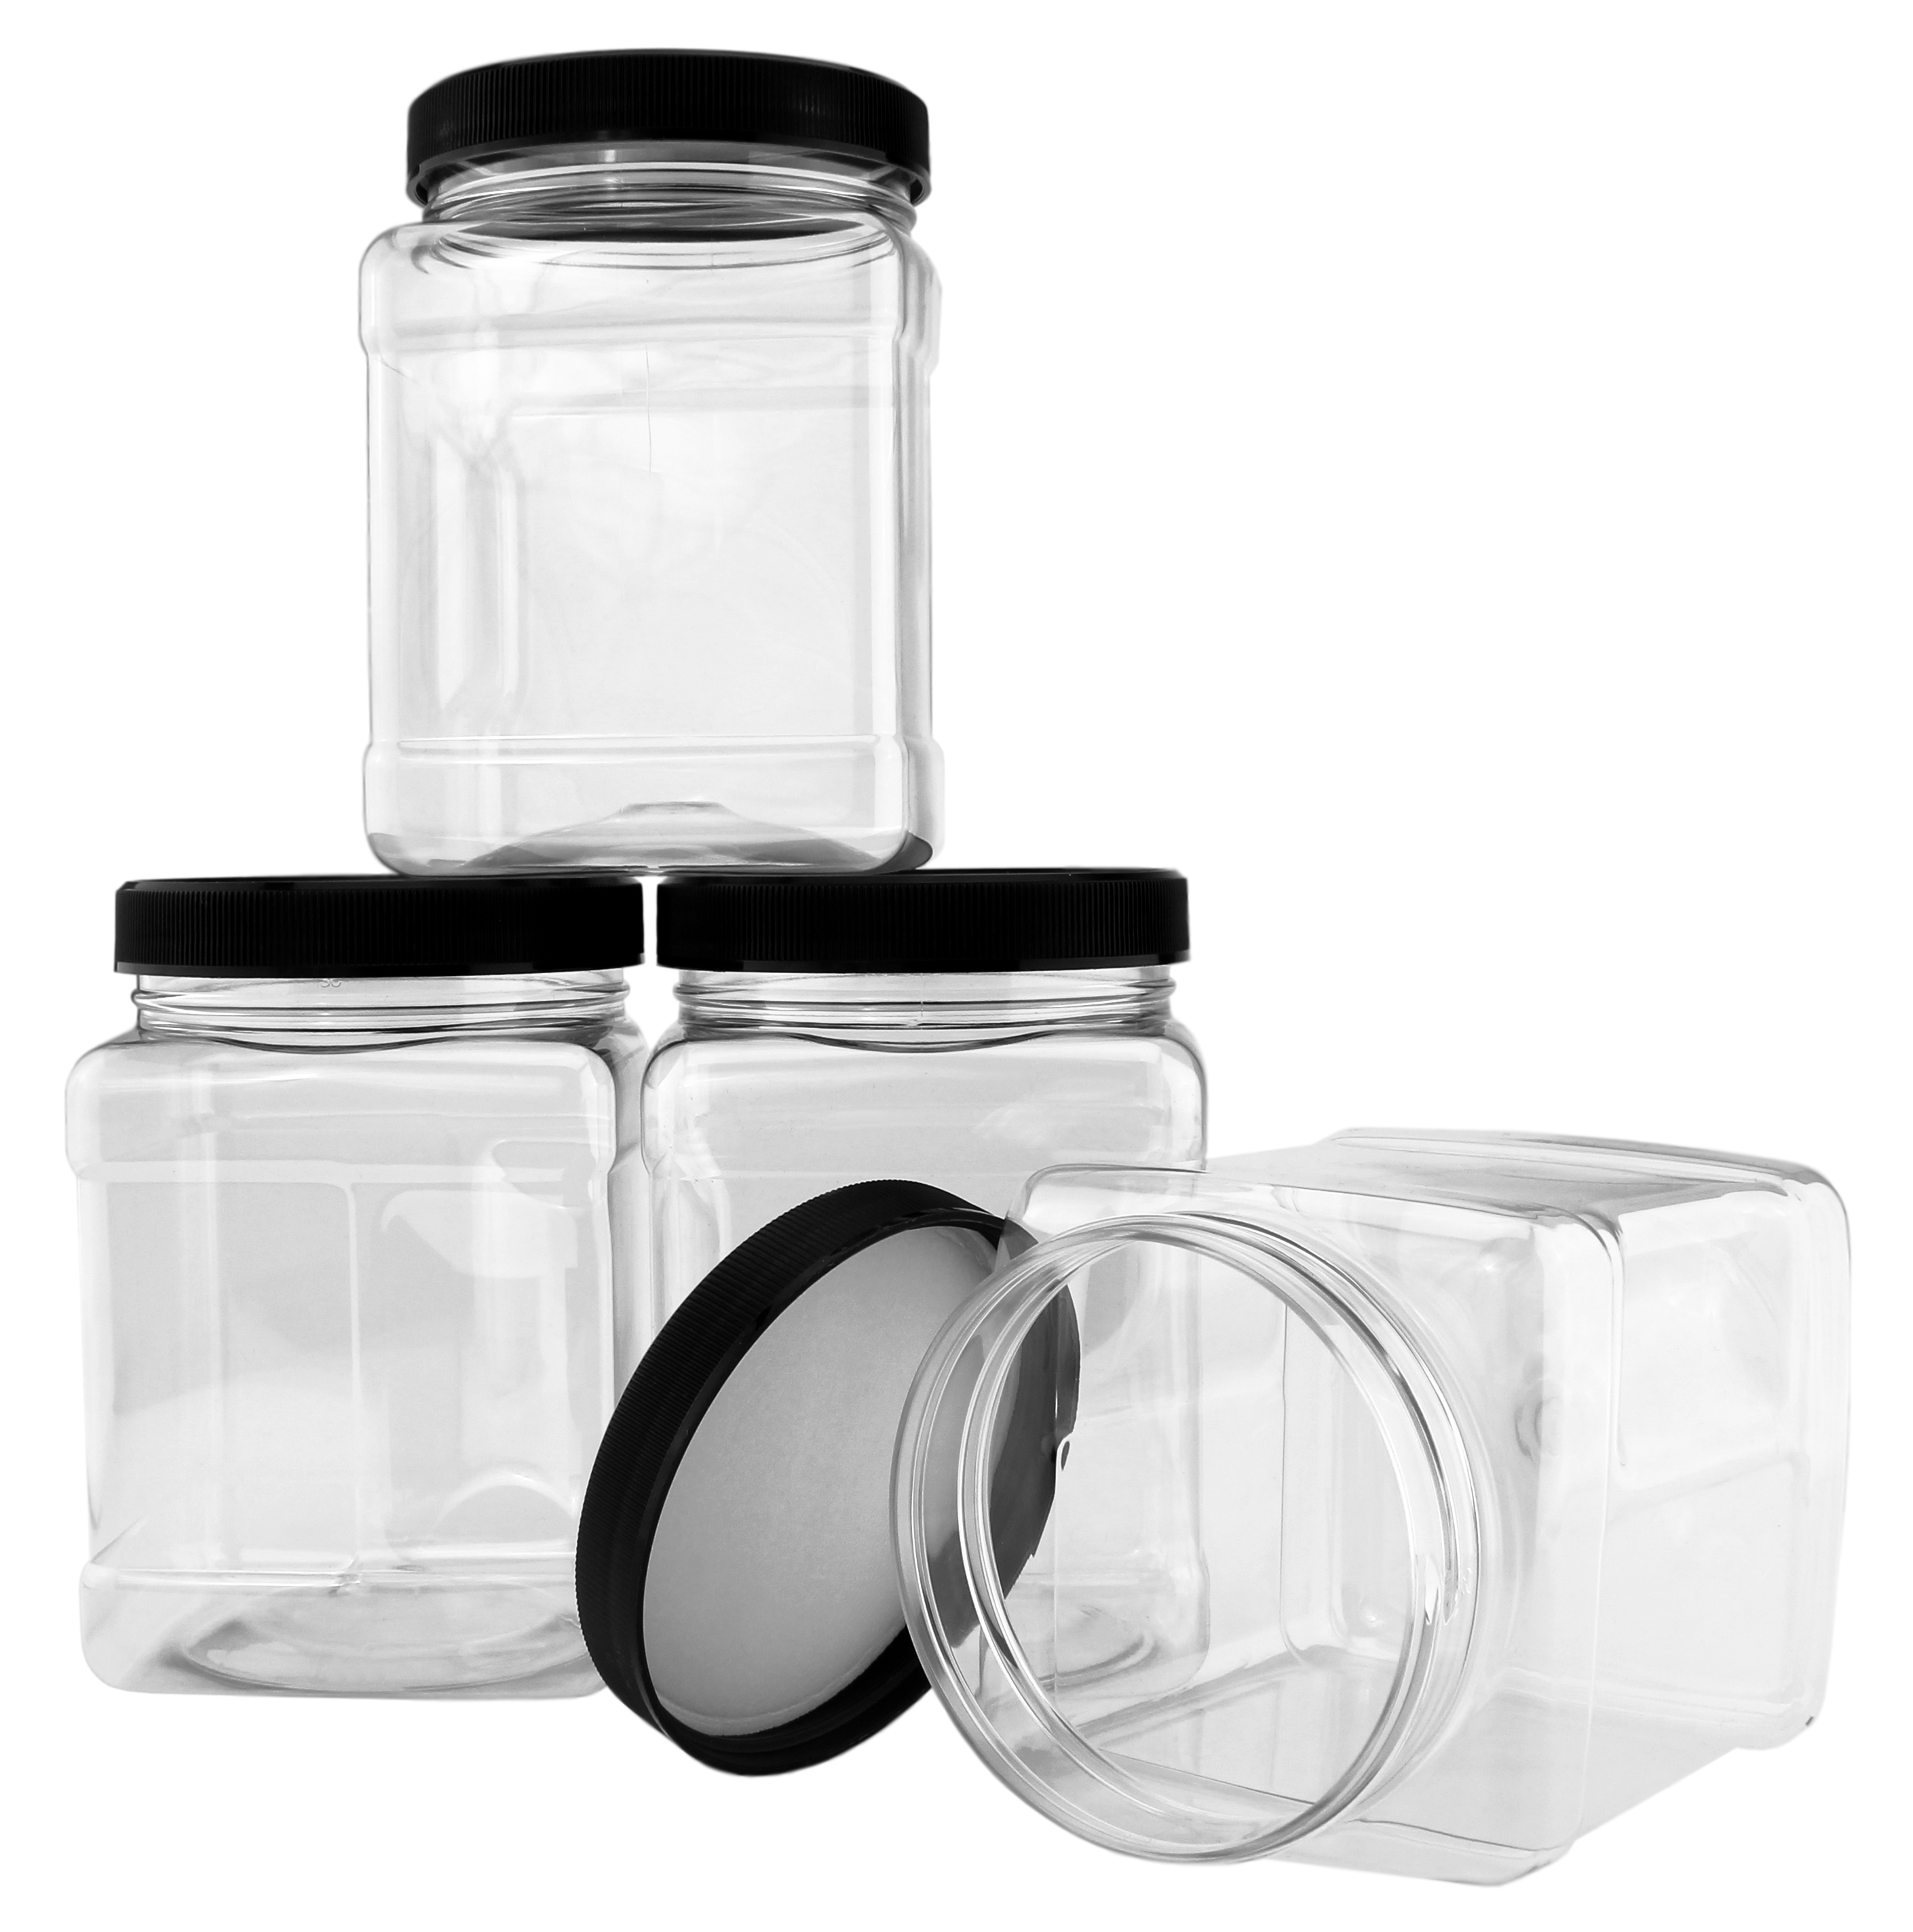 B078SF8L4D - 32-Ounce Square Plastic Jars (4-Pack) 3